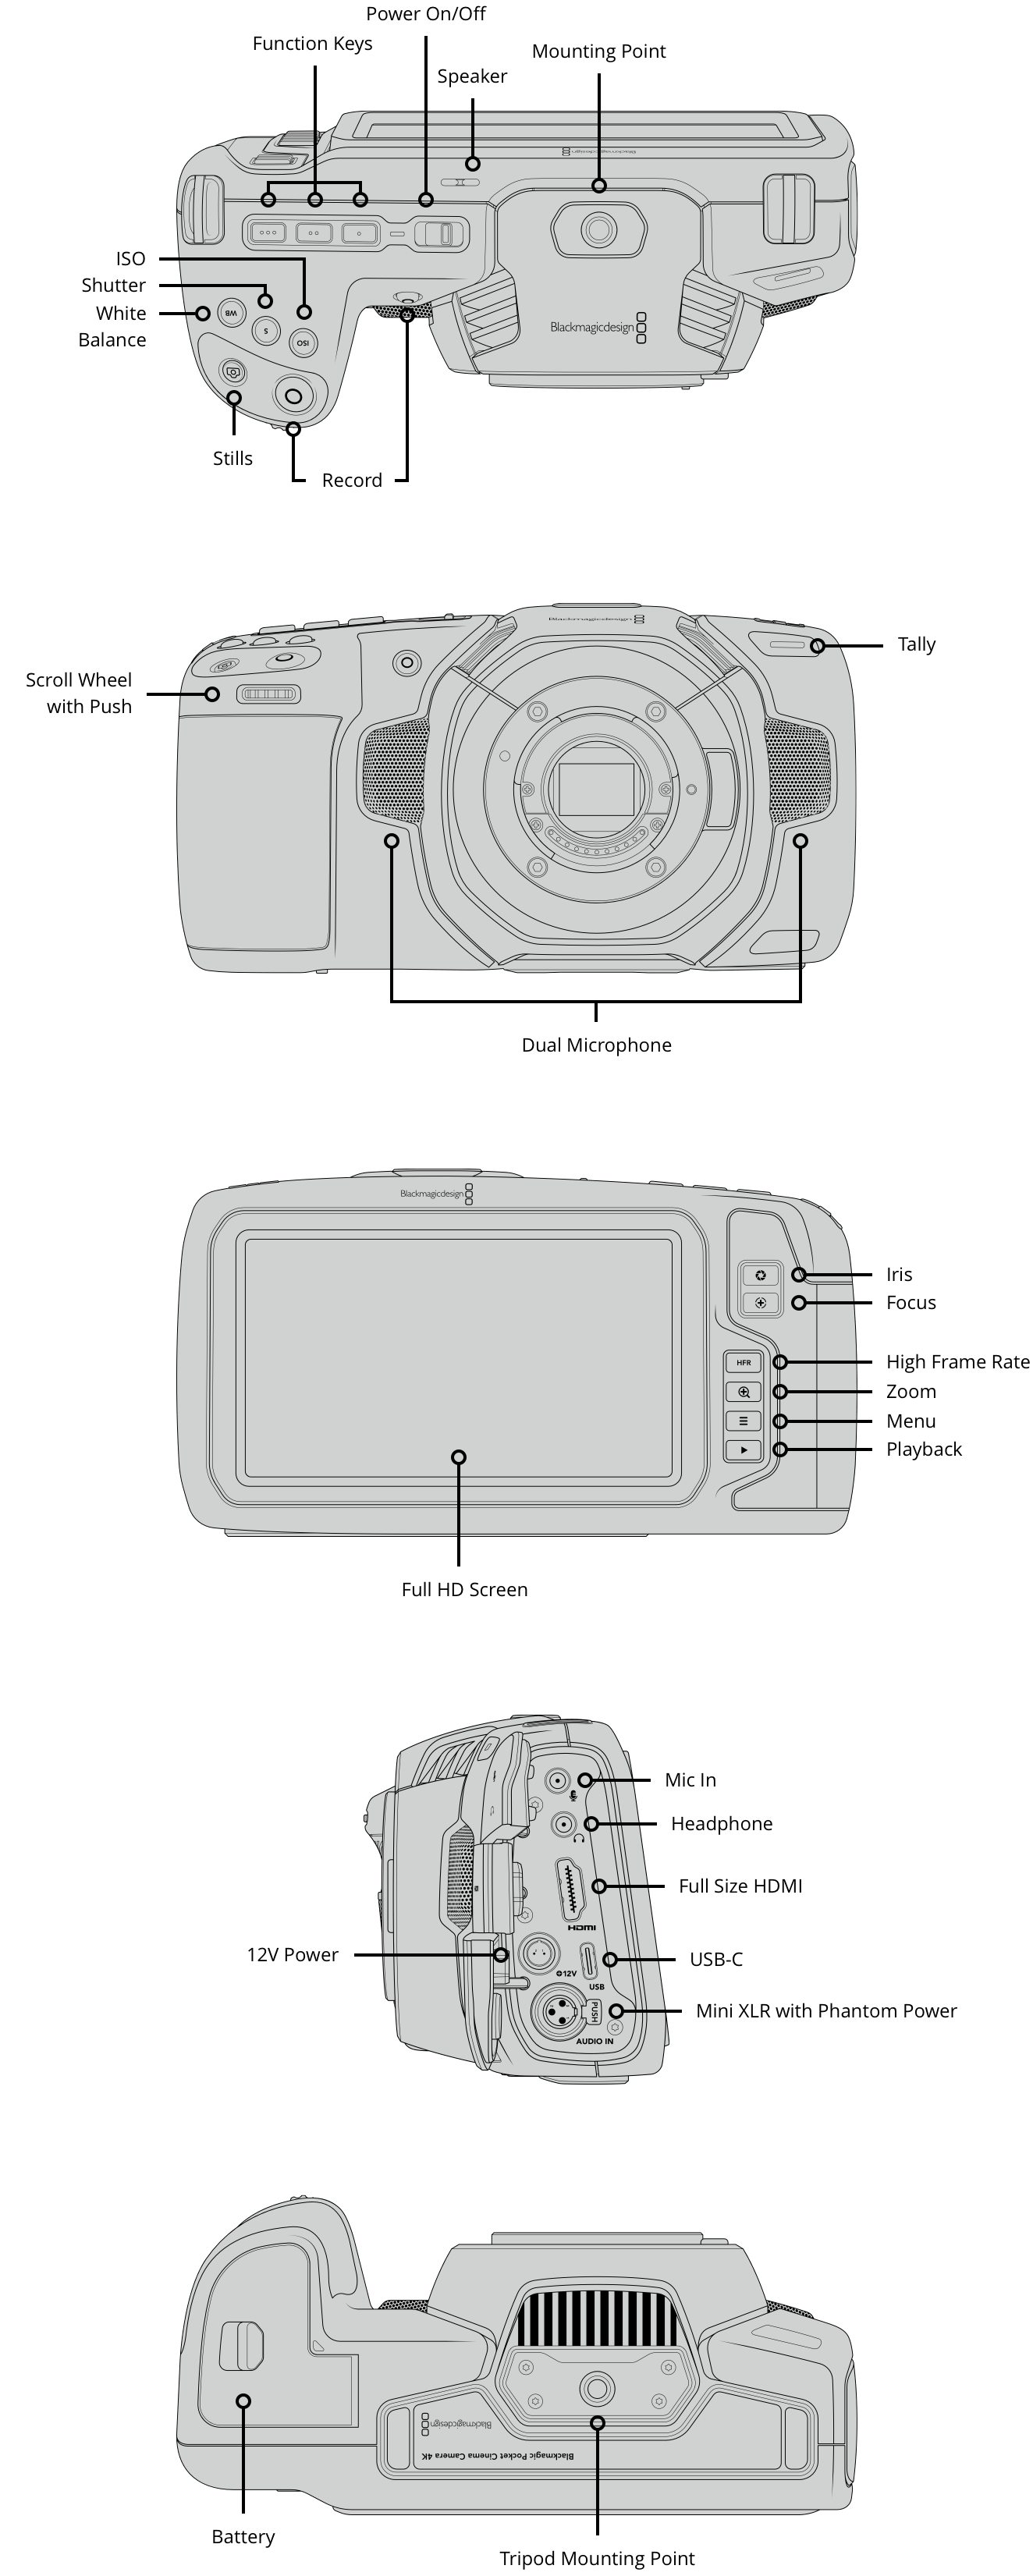 Nab 2018 Blackmagic Pocket Cinema Camera 4k Page 34